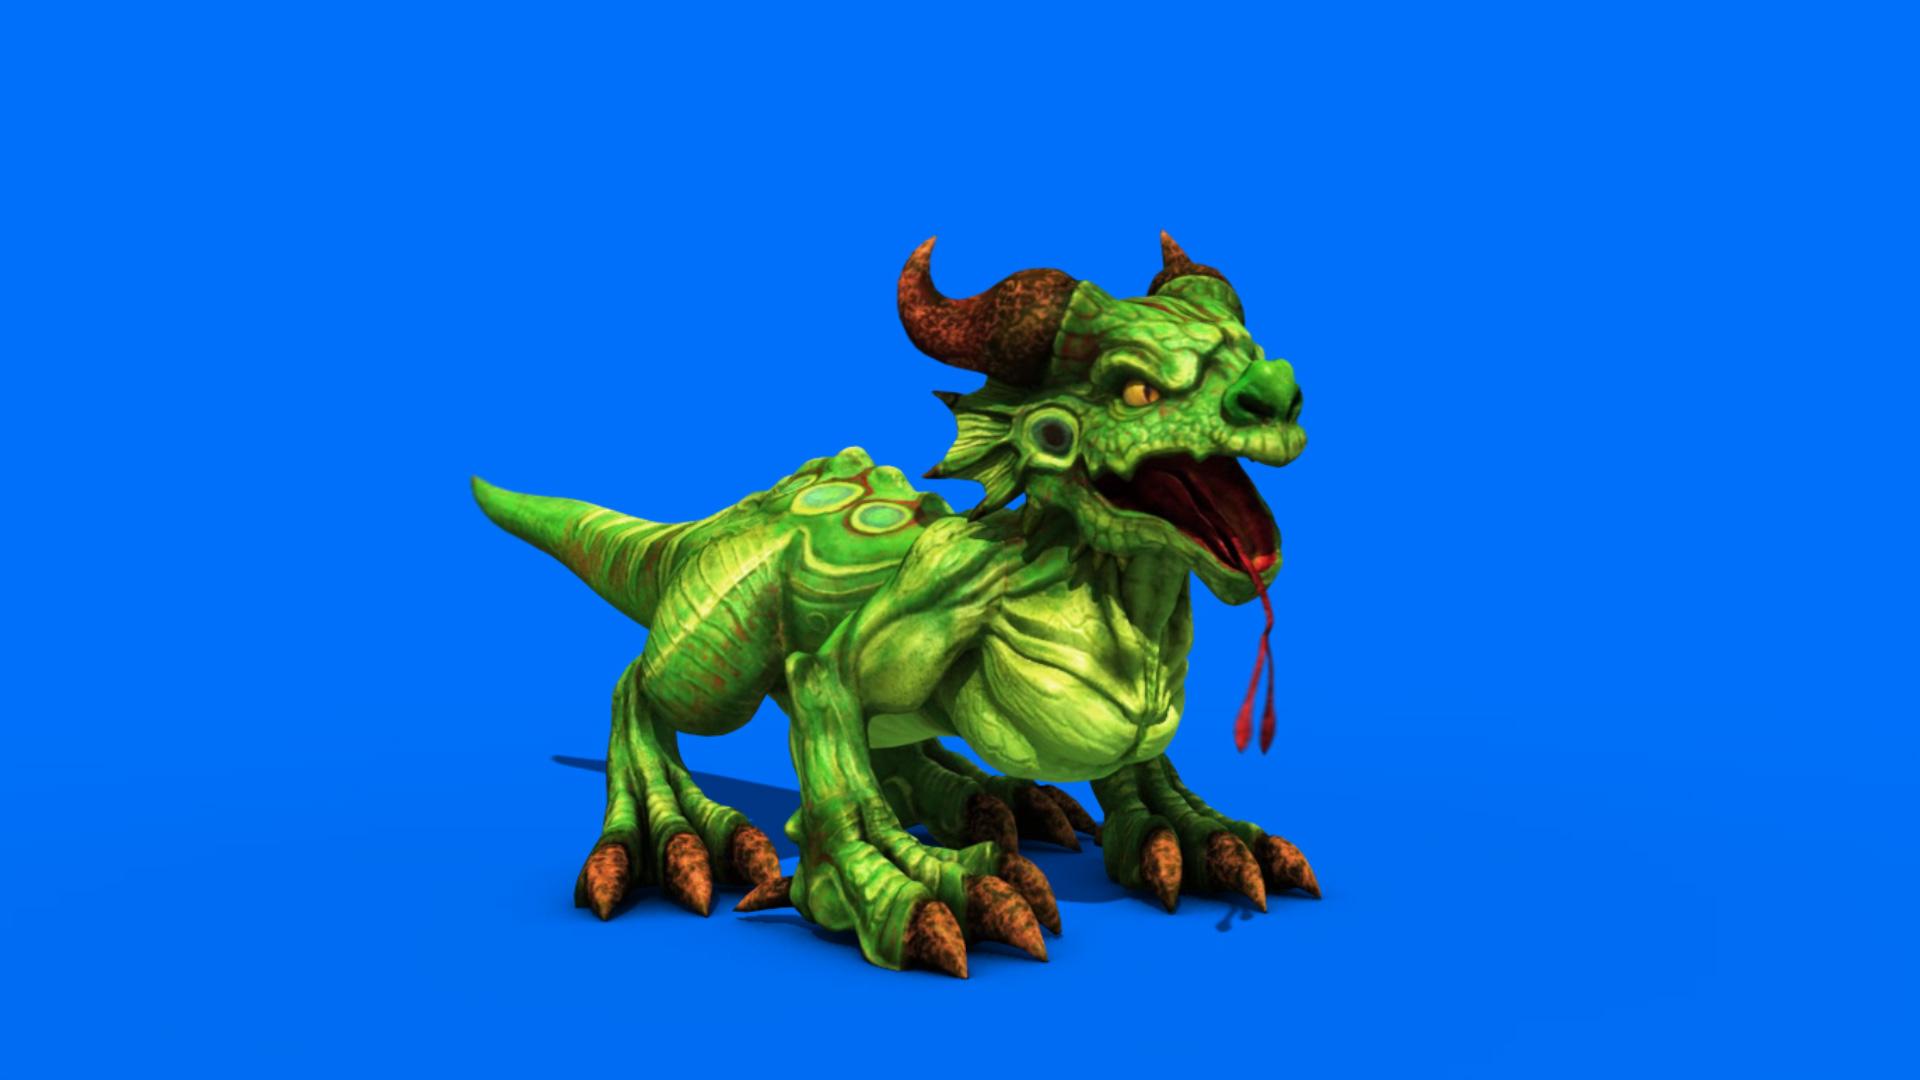 Tiny Dragon Play - 3D Model Animated